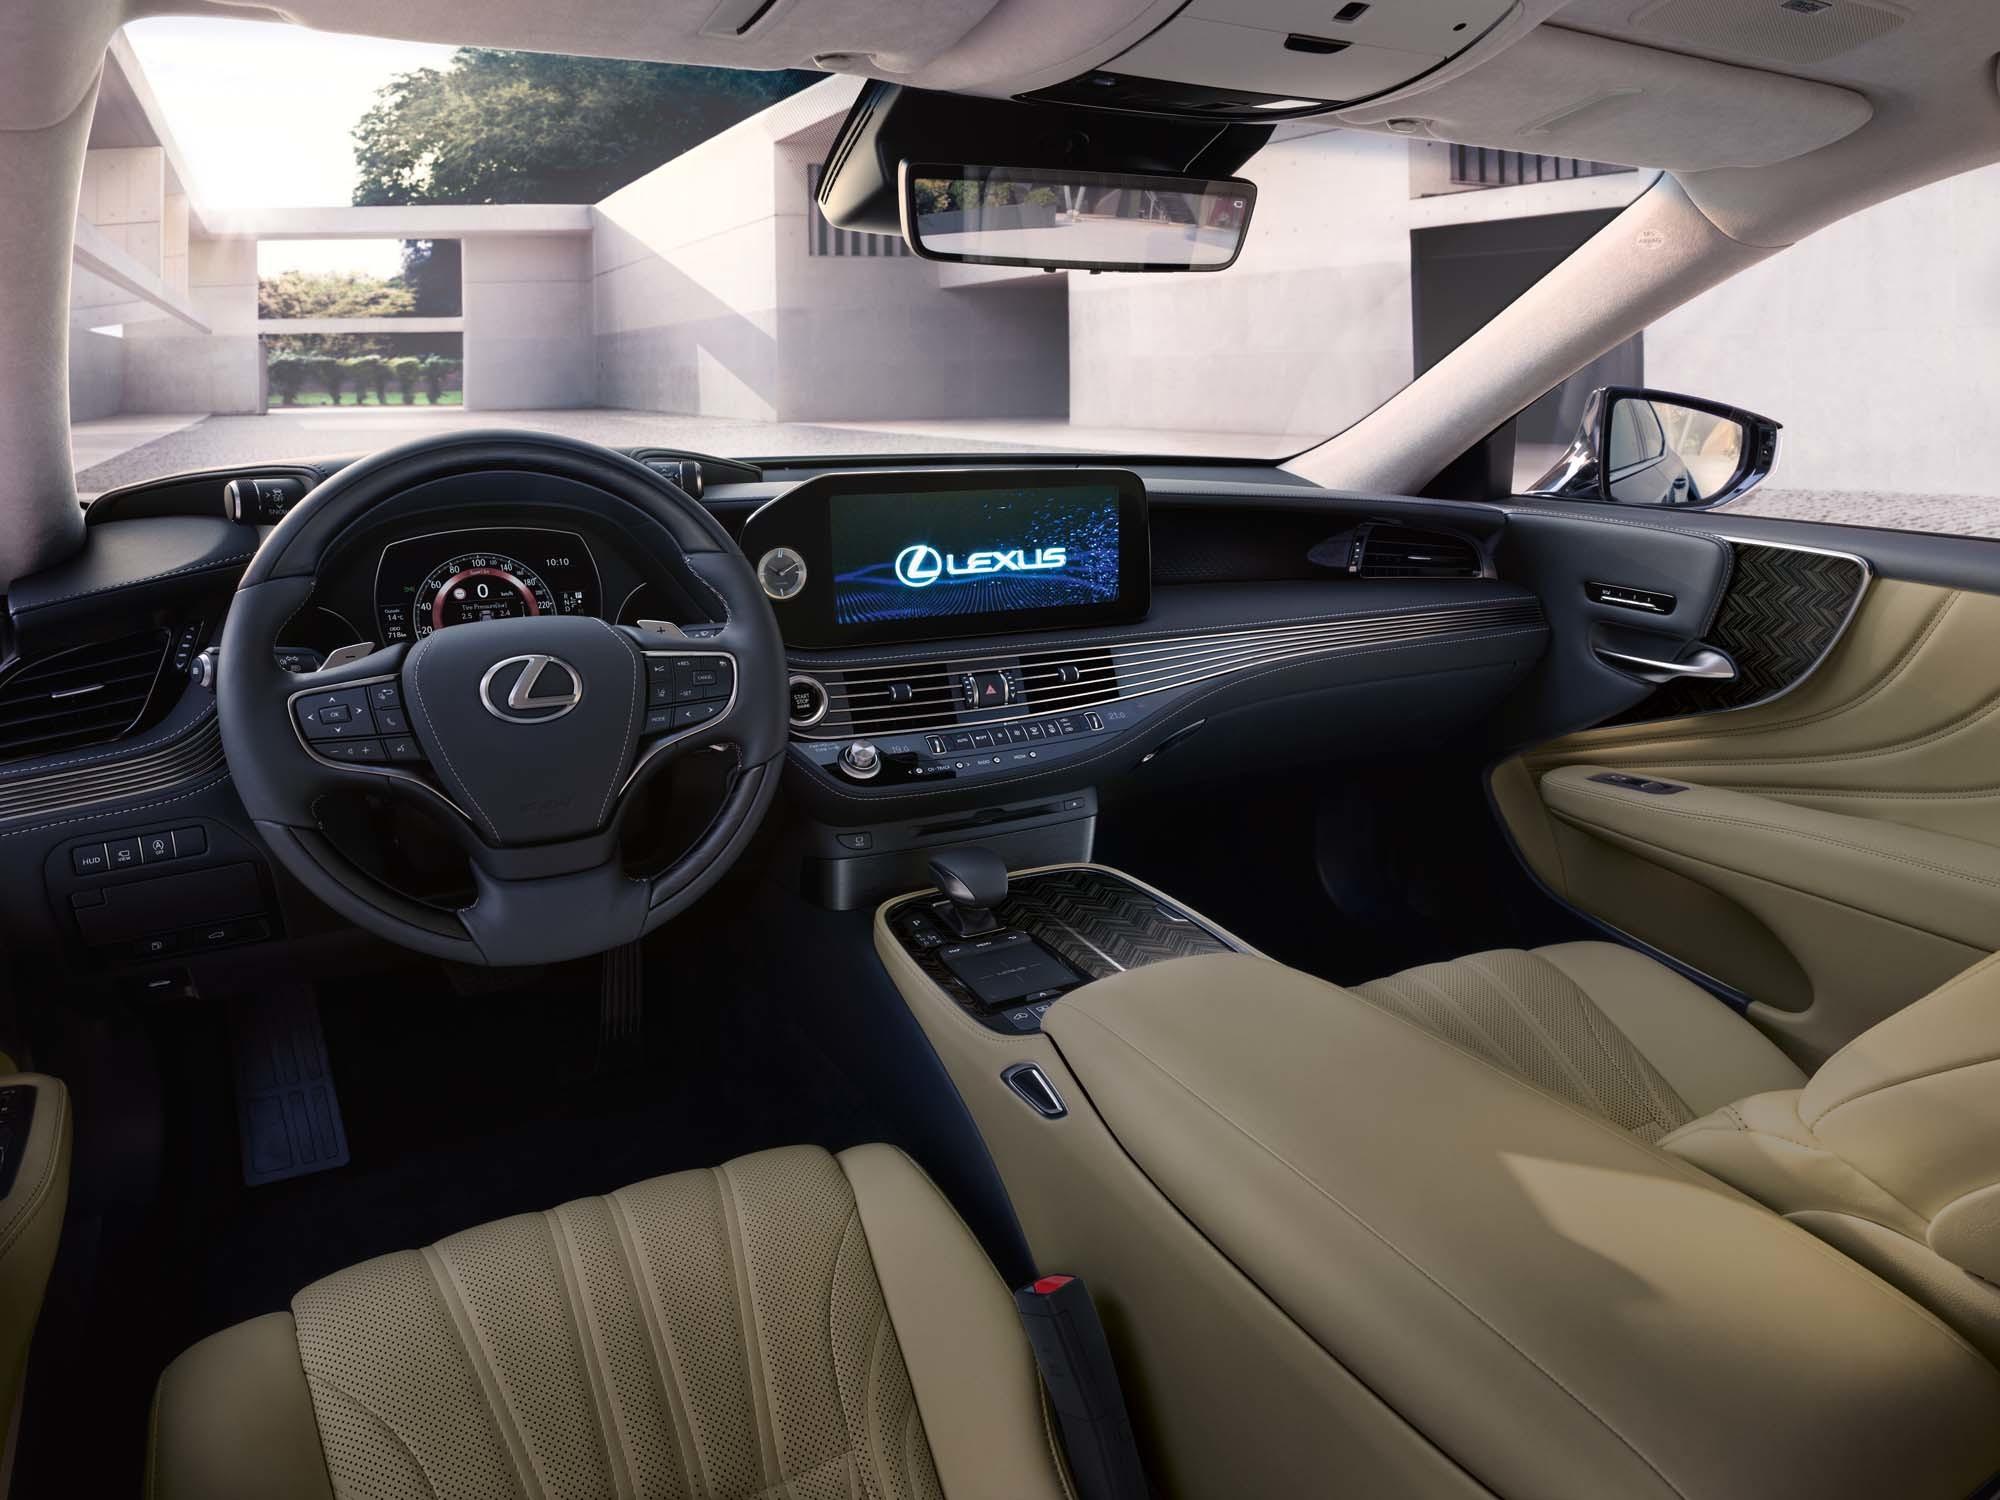 Стартовали продажи флагманского Lexus LS